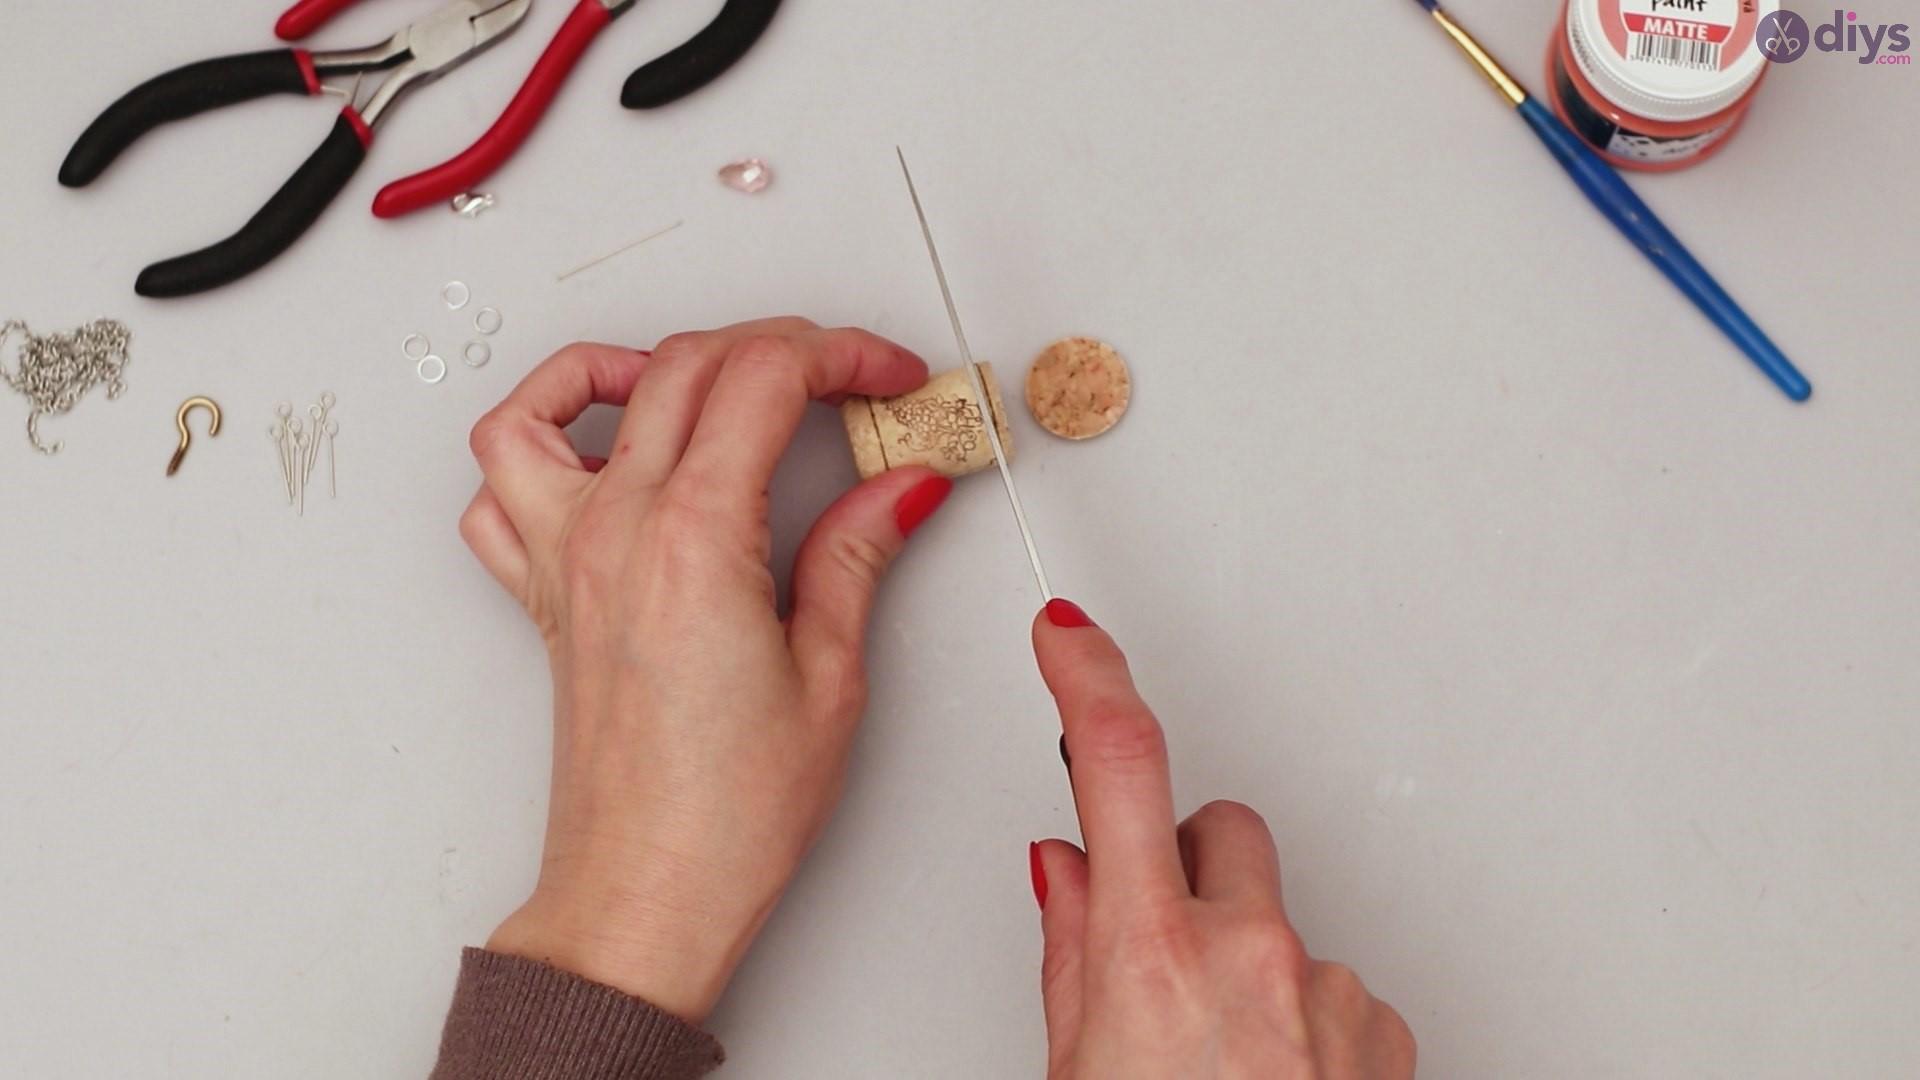 Diy wine cork necklace (2)